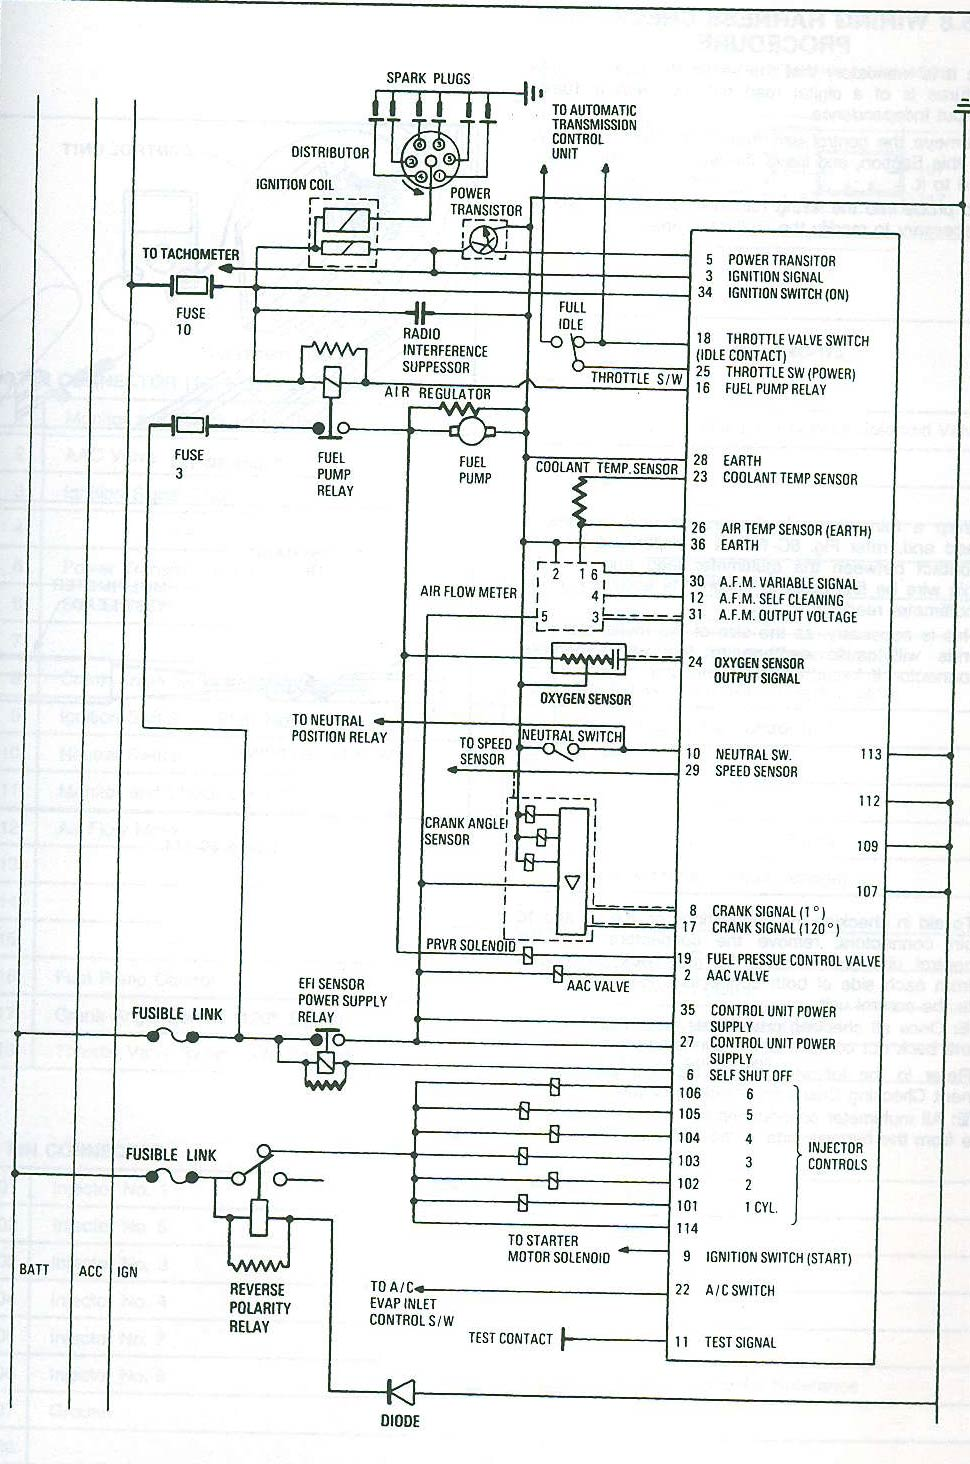 Rb20 Wiring Diagram | Online Wiring Diagram